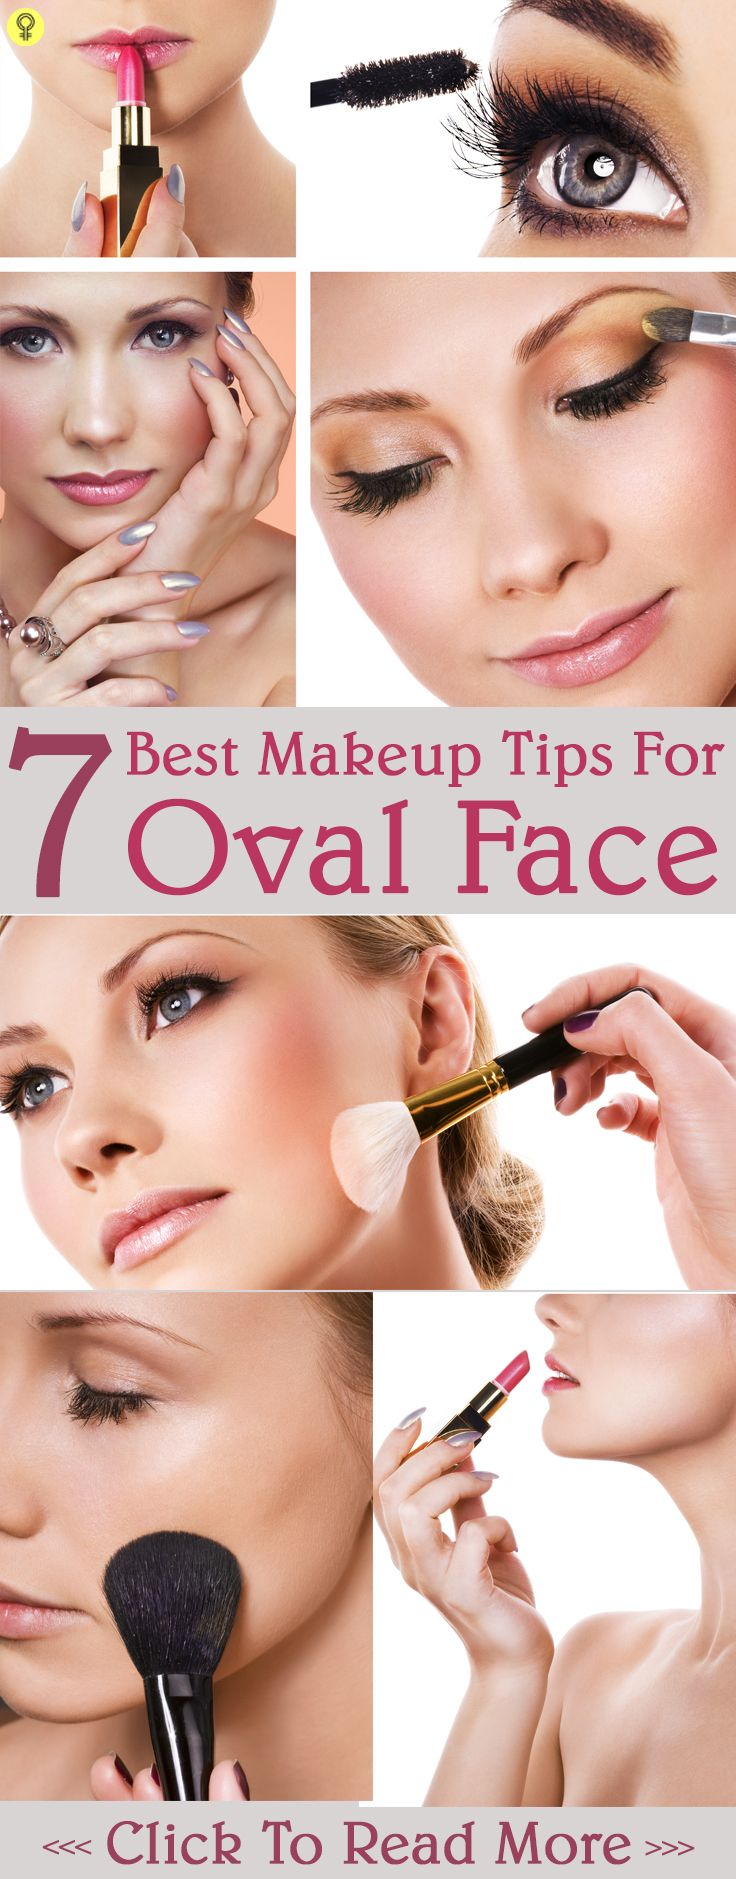 best makeup images on pinterest beauty makeup make up looks